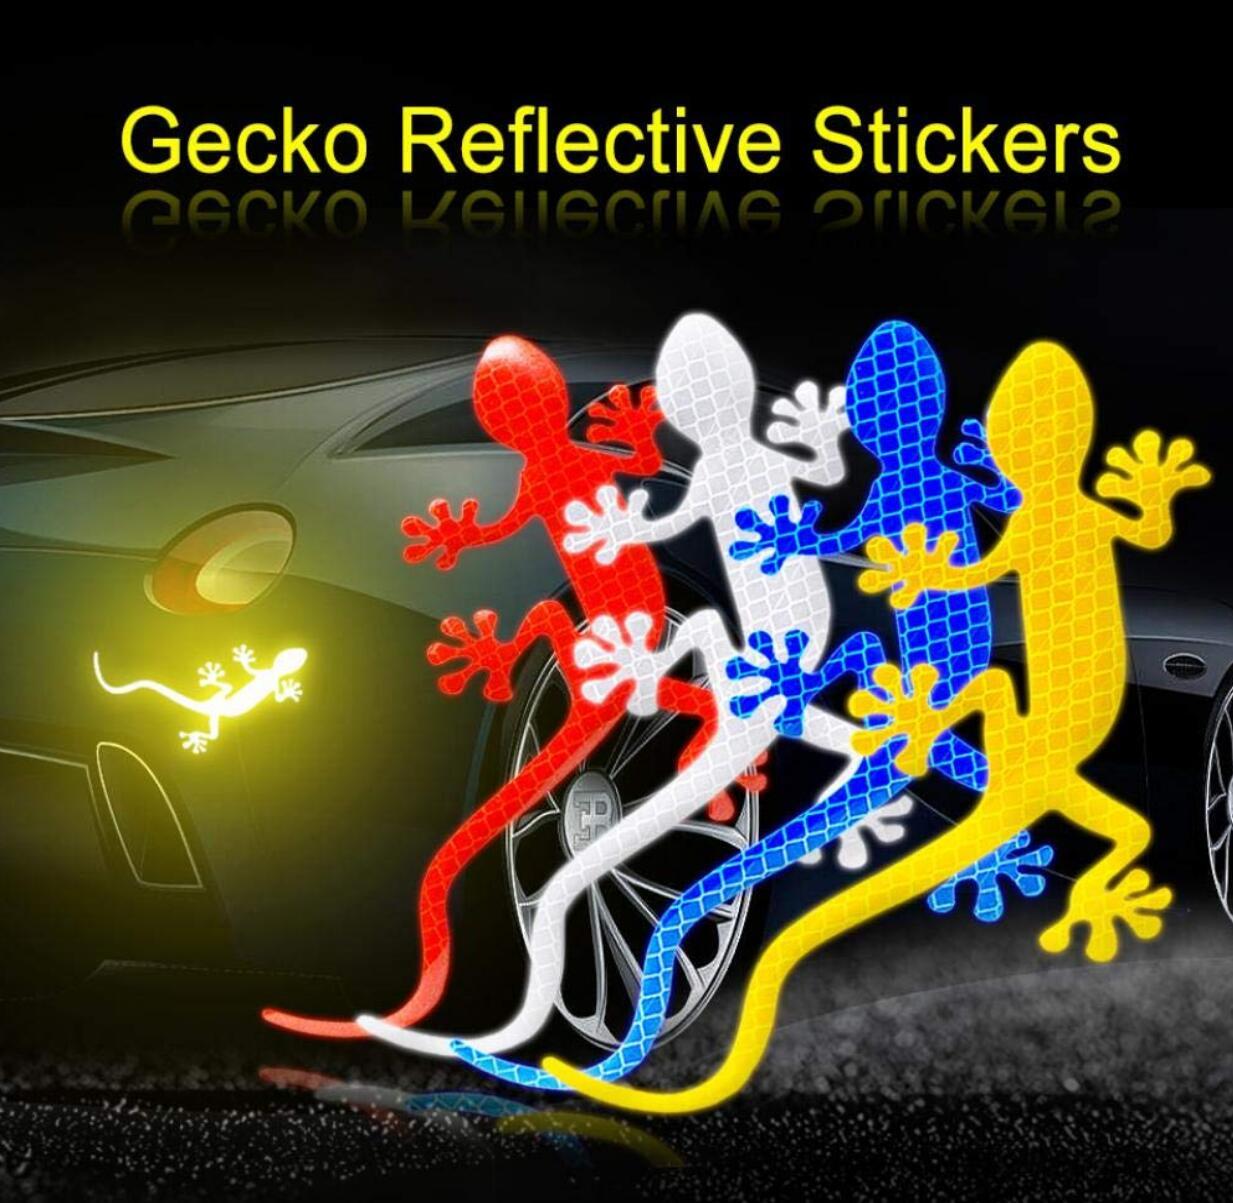 Auto Faixa Reflexiva Fita Para Audi A3 8V A4 B5 B6 B7 B8 A6 C5 A5 TT Q3 Q5 Q7 80 100 A1 A2 A7 A8 S3 S4 R8 RS Quattro S linha